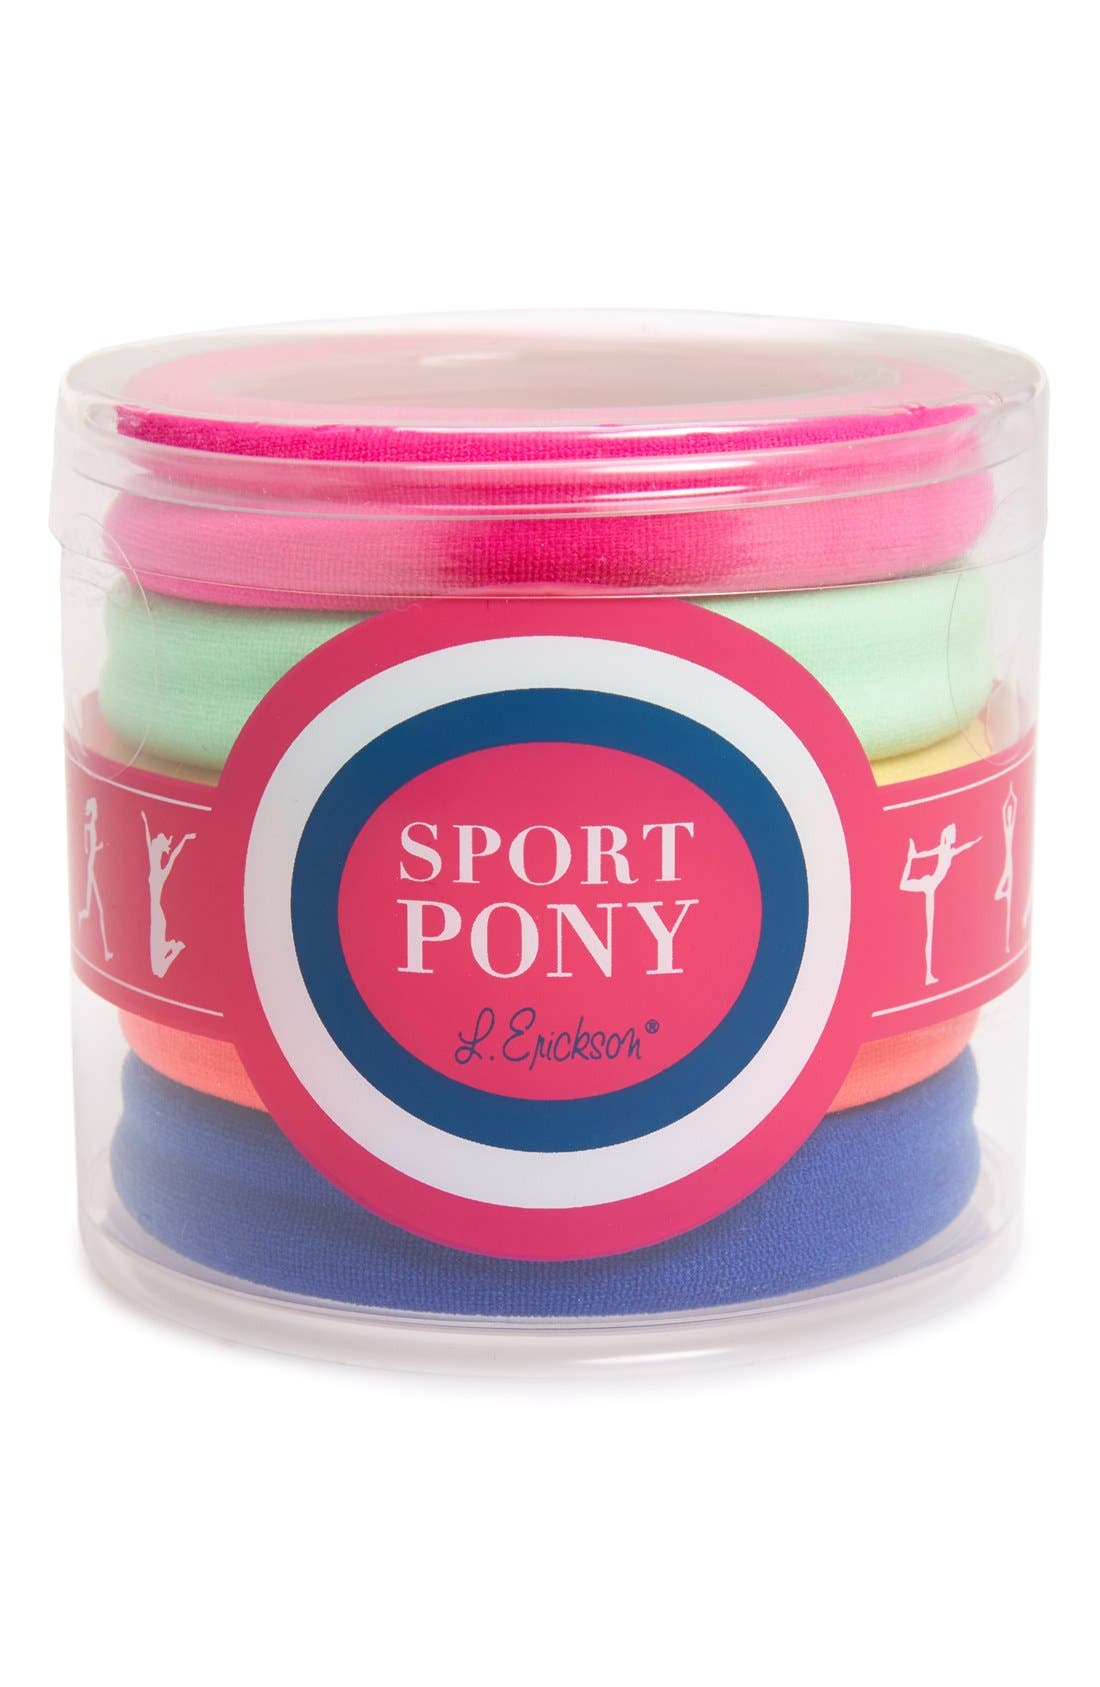 L. Erickson Set of 5 Sport Ponytail Holders